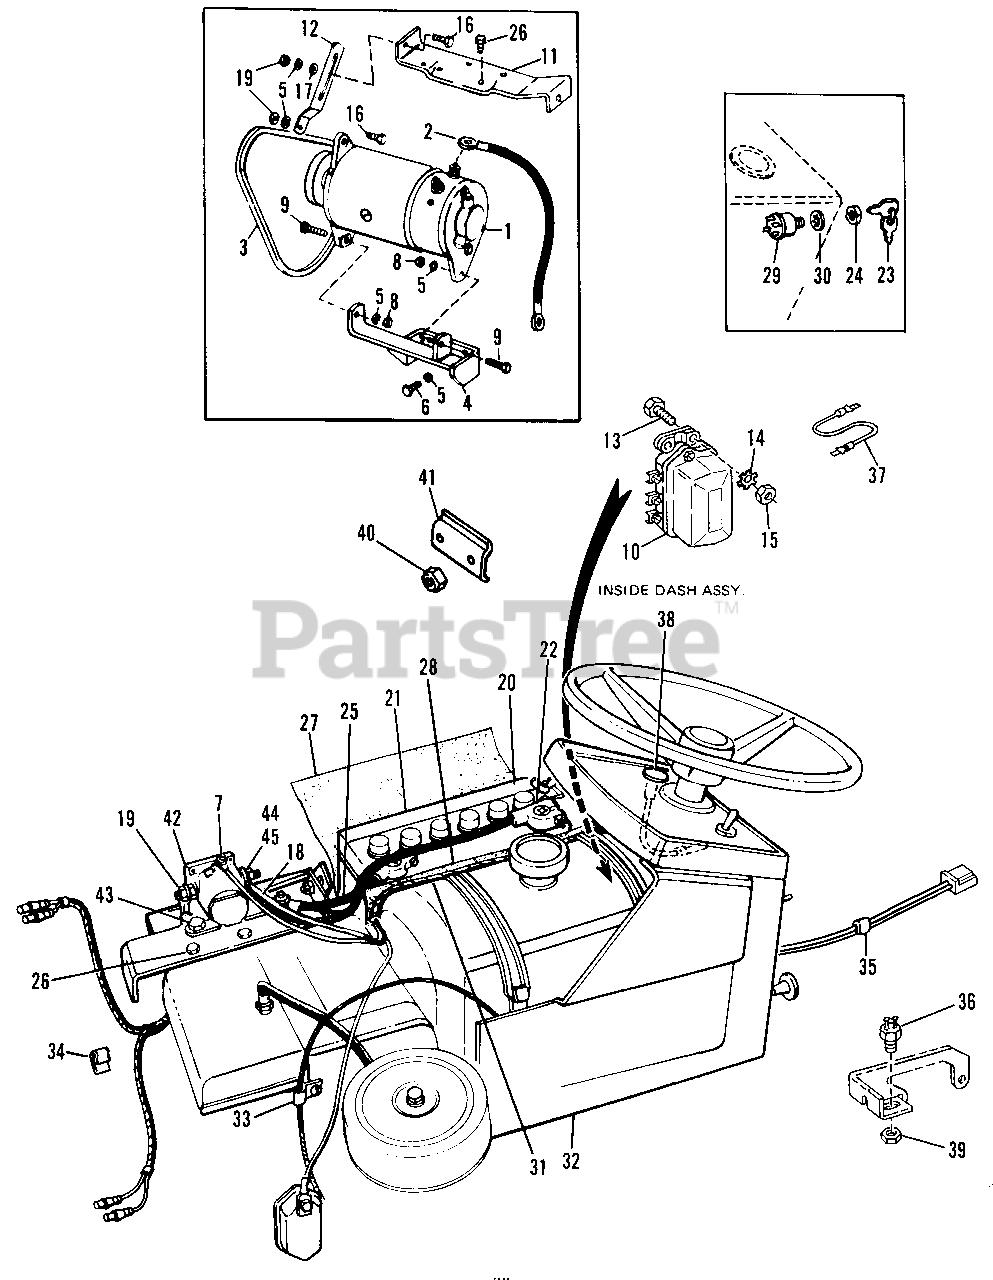 simplicity mower wiring diagram simplicity starter solenoid wiring diagram source wiring diagram  starter solenoid wiring diagram